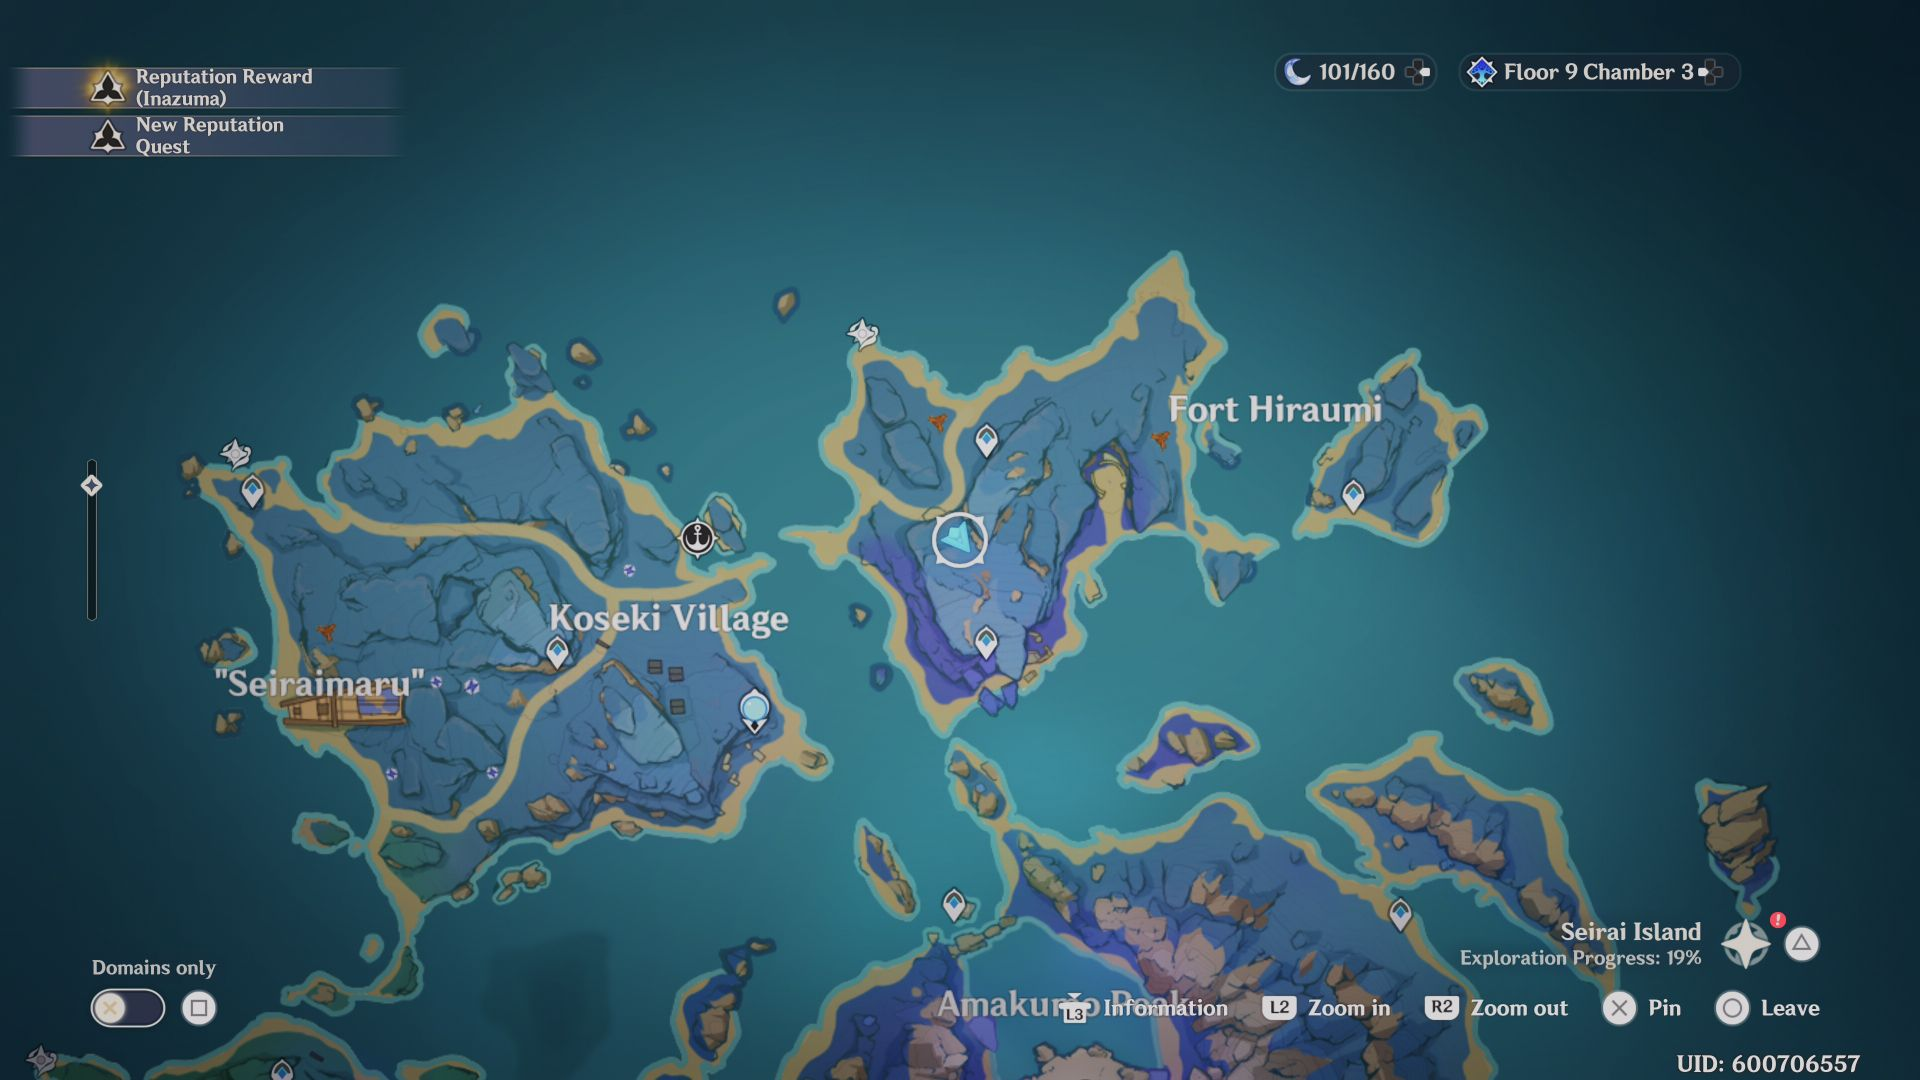 Genshin Impact: How to Go to Seirai Island and Take Pictures